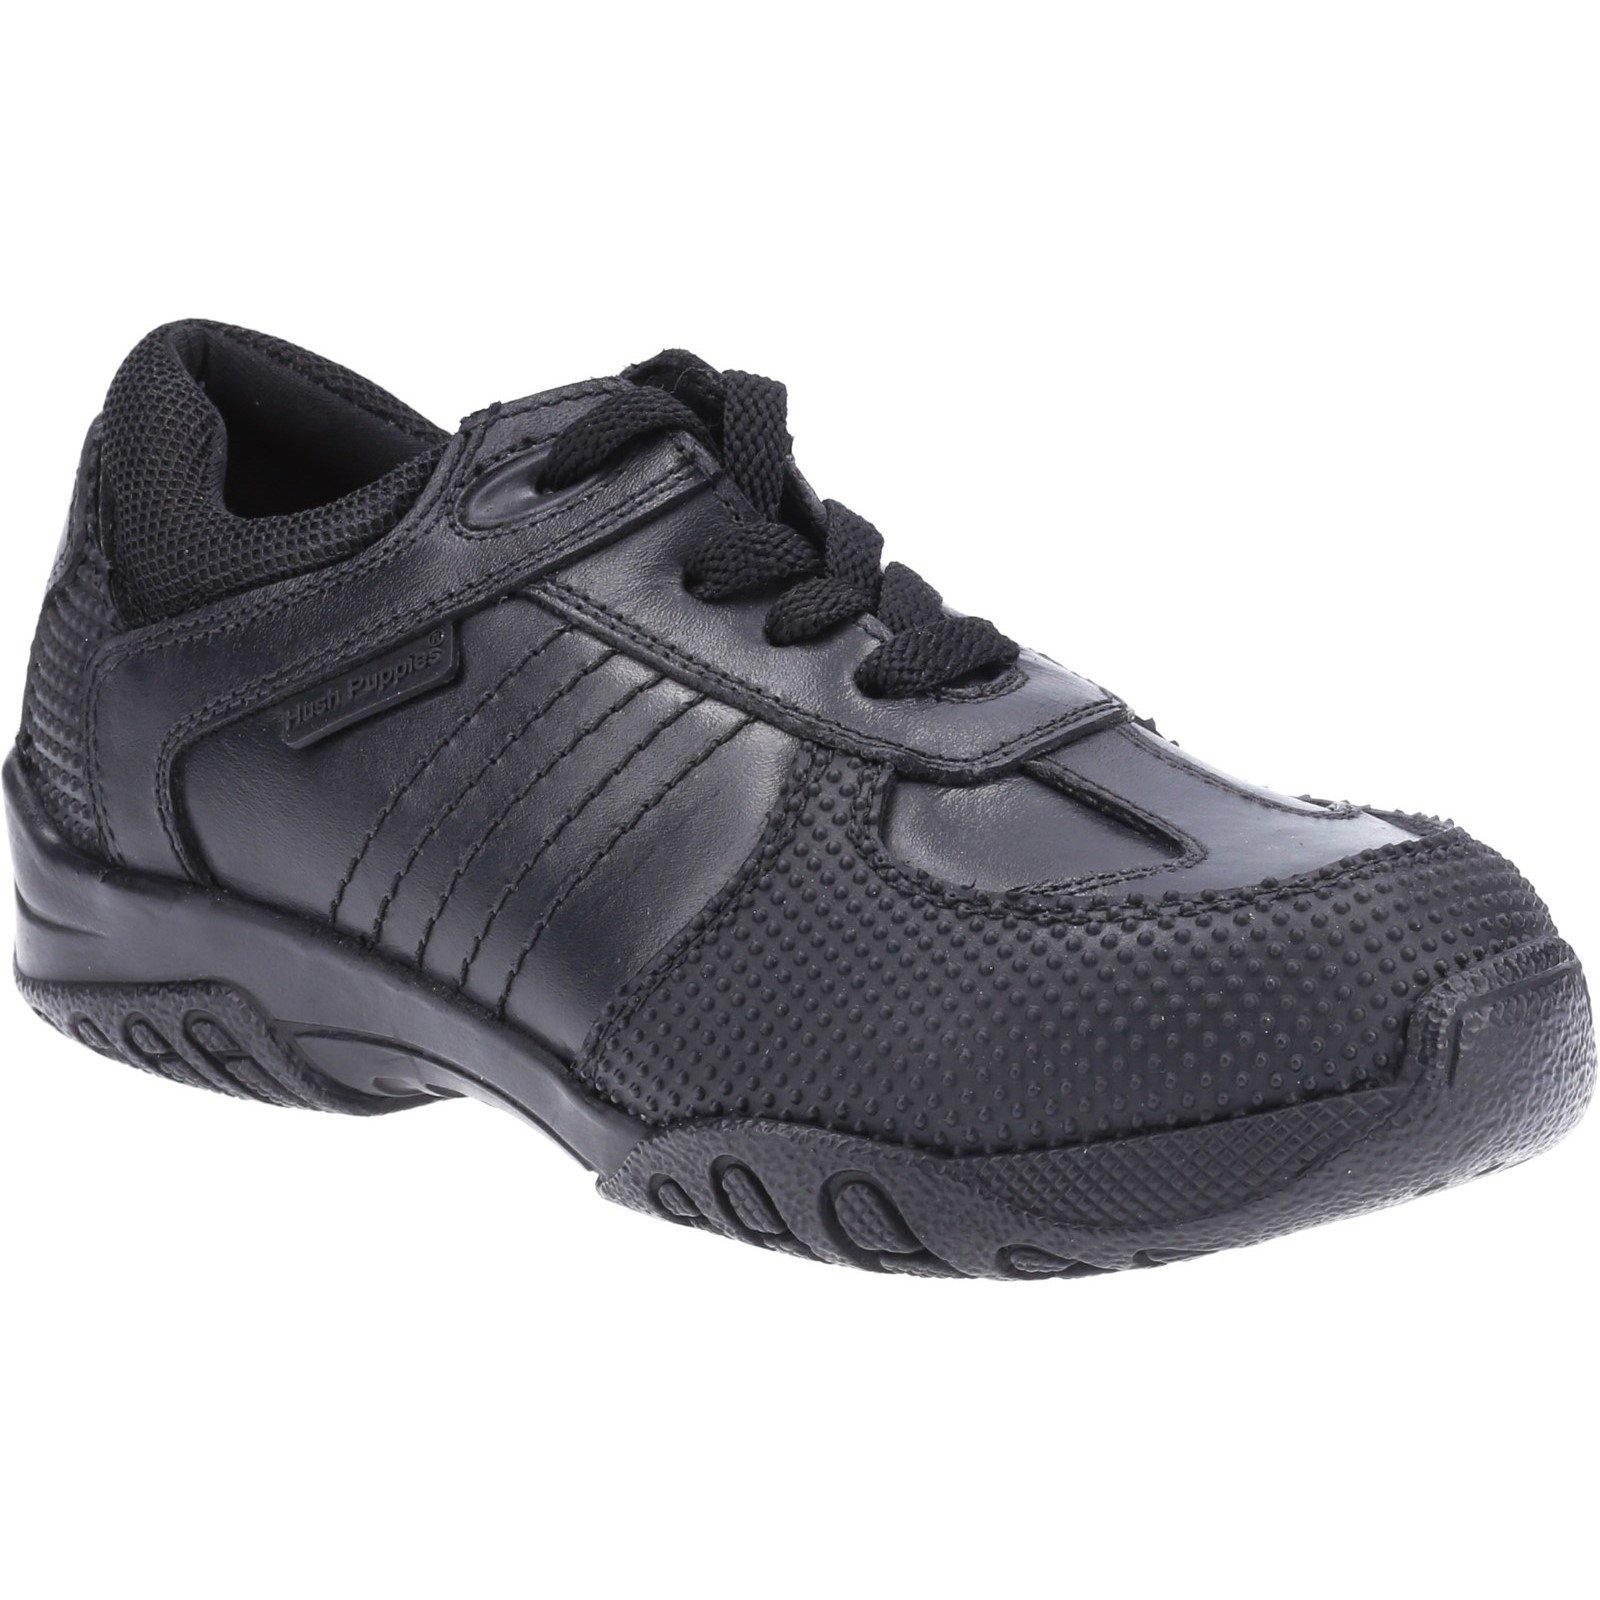 Hush Puppies Kid's Jezza Junior School Shoe Black 32587 - Black 1.5